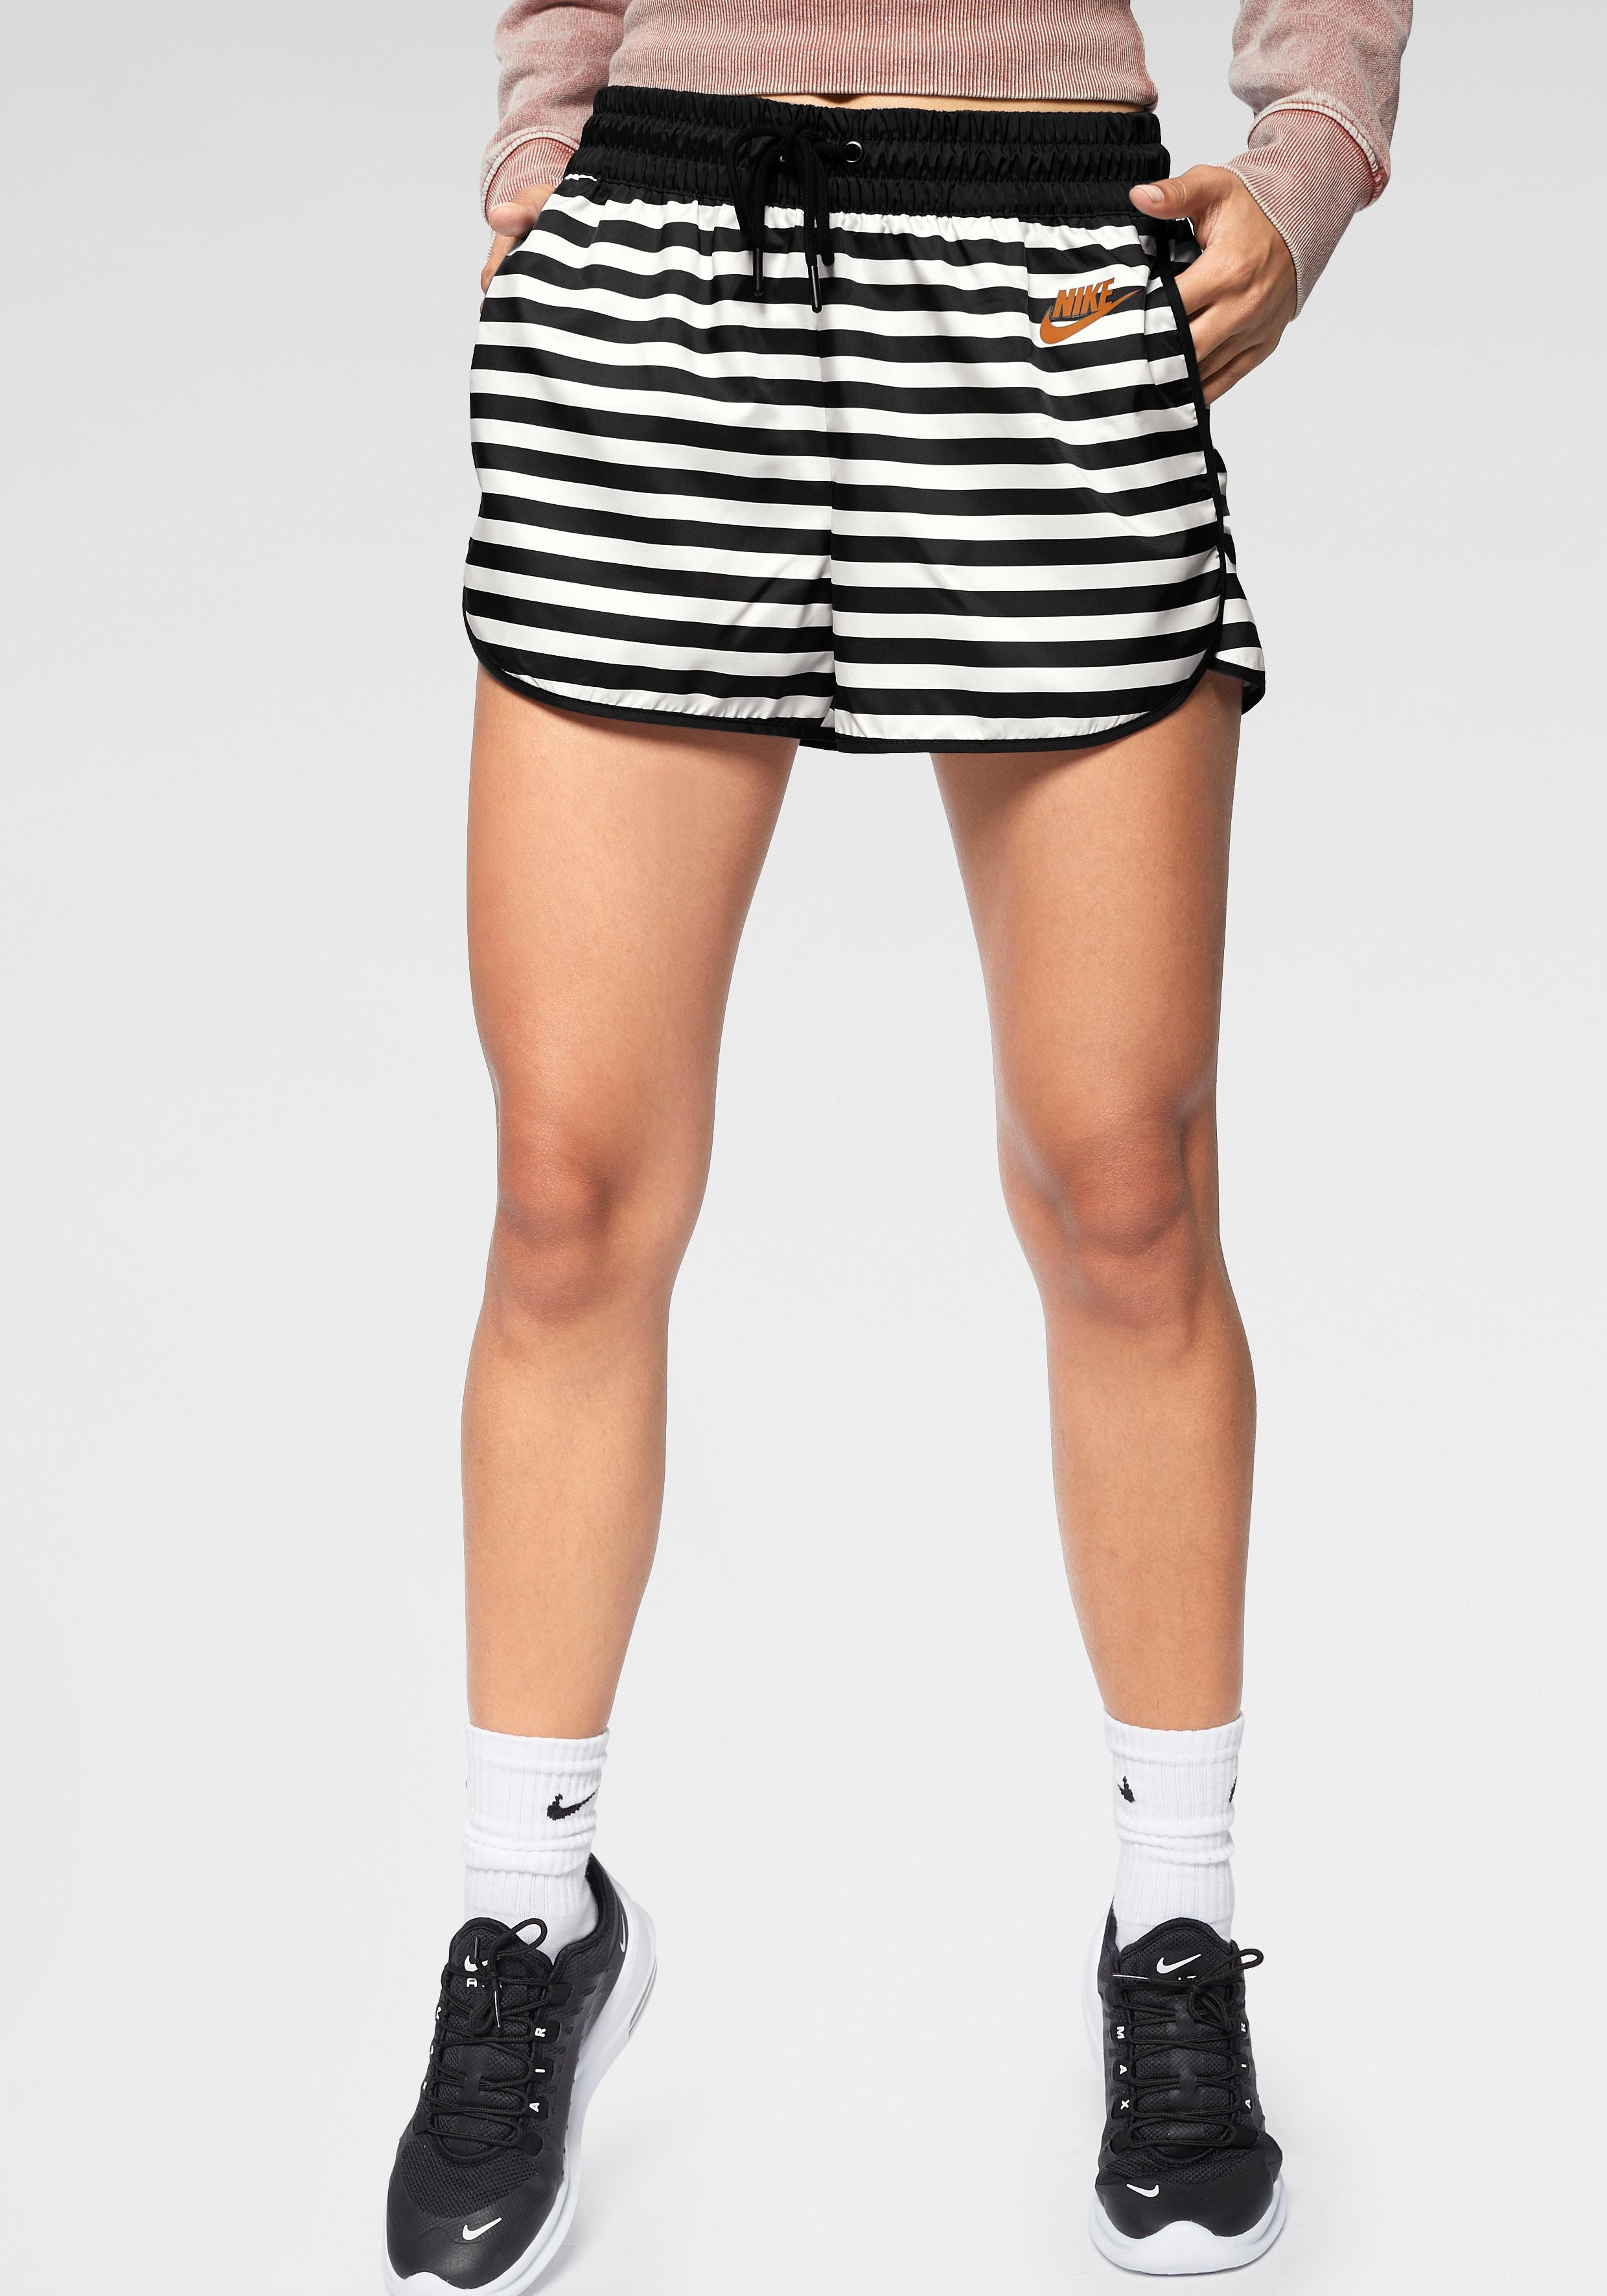 Nike Sportswear Shorts WOMAN NIKE SPORTSWEAR WHITE/BLACK/WHITE/DESERT OCHRE | Sportbekleidung > Sporthosen > Sportshorts | Nike Sportswear